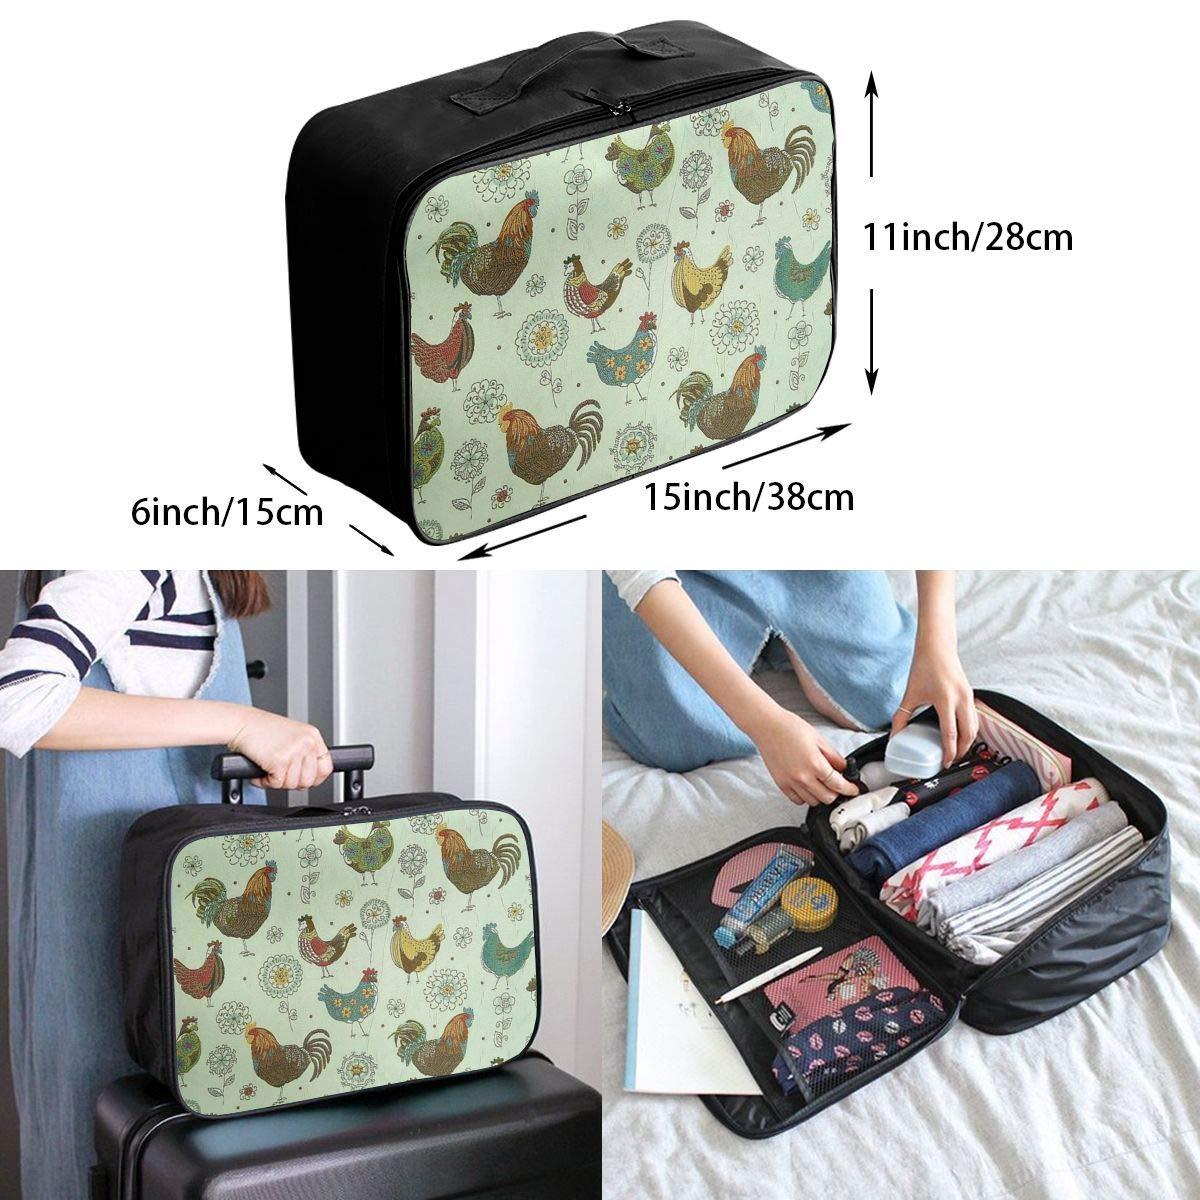 Travel Luggage Duffle Bag Lightweight Portable Handbag Chicken Painting Large Capacity Waterproof Foldable Storage Tote